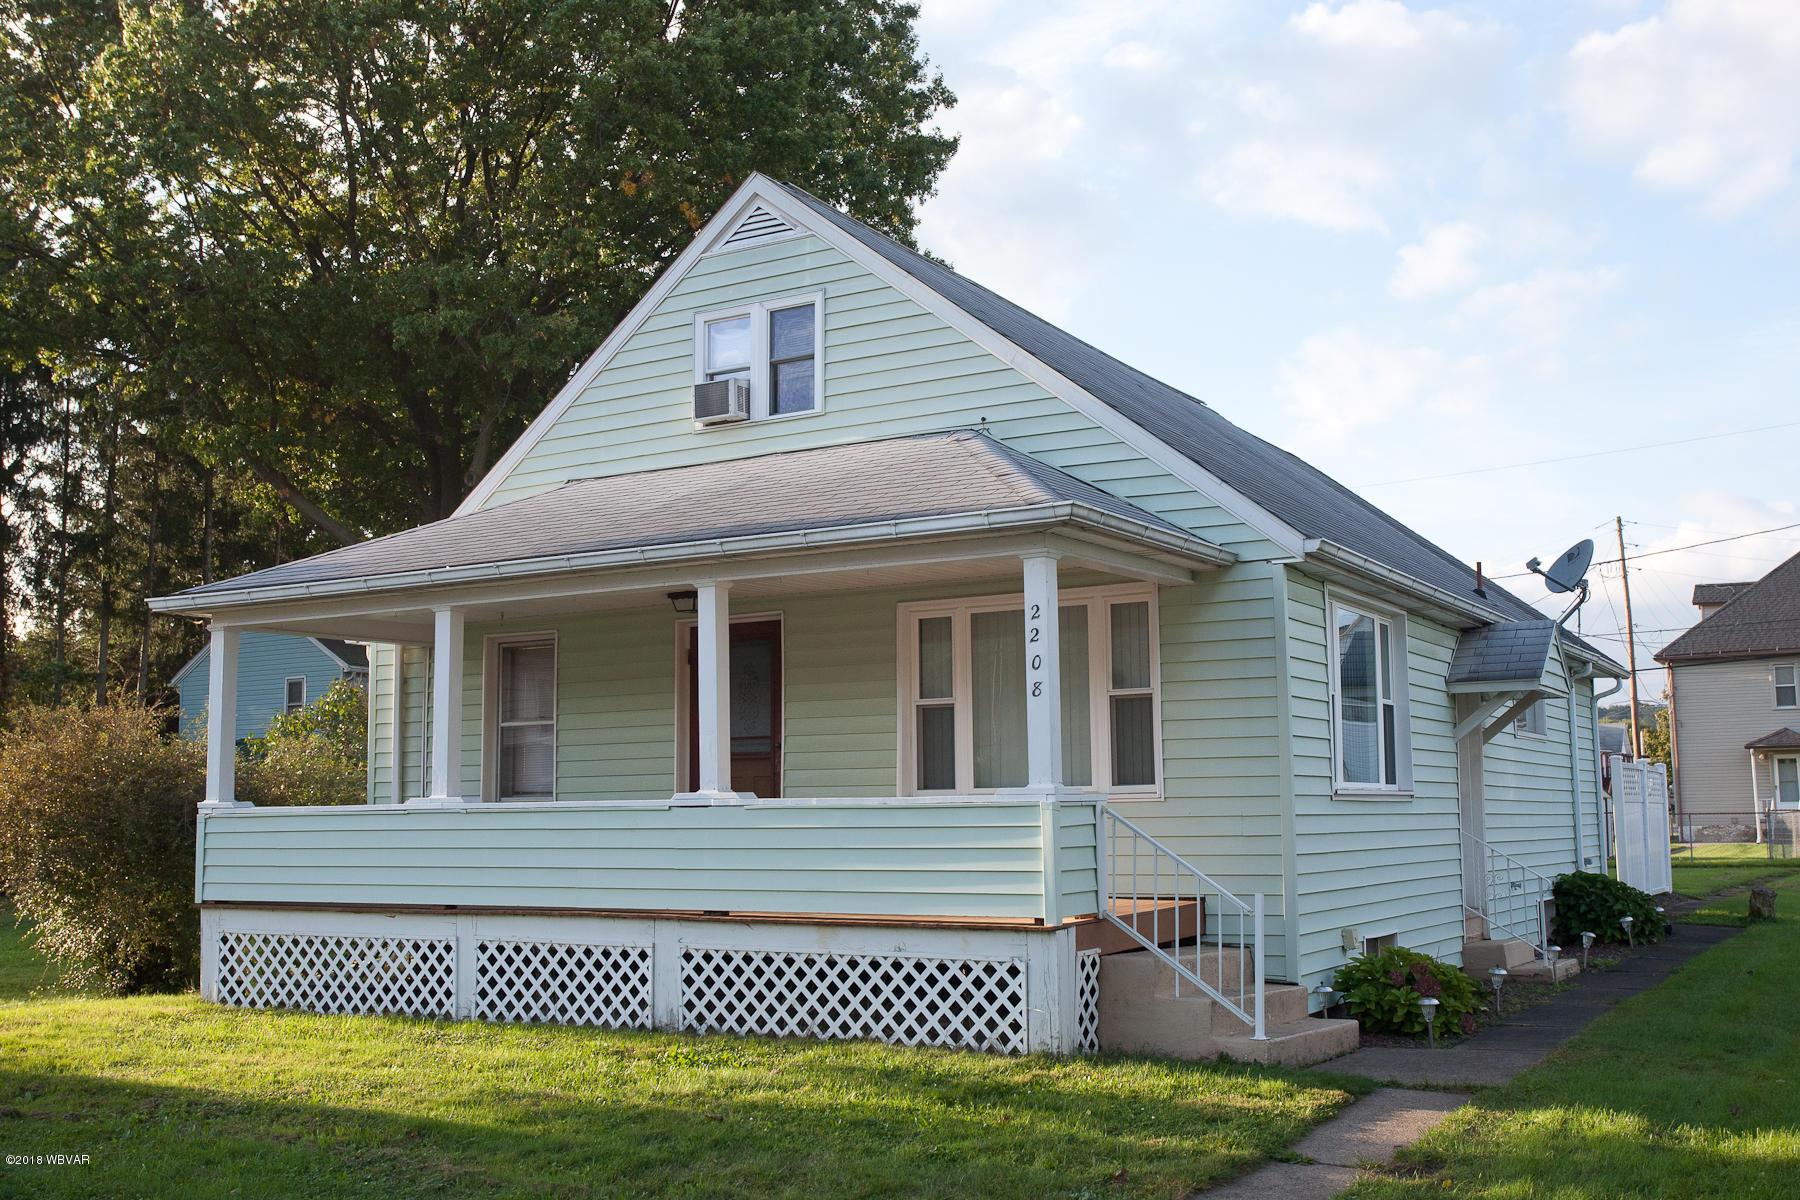 2208 ROYAL AVENUE,Williamsport,PA 17701,3 Bedrooms Bedrooms,2 BathroomsBathrooms,Residential,ROYAL,WB-86944